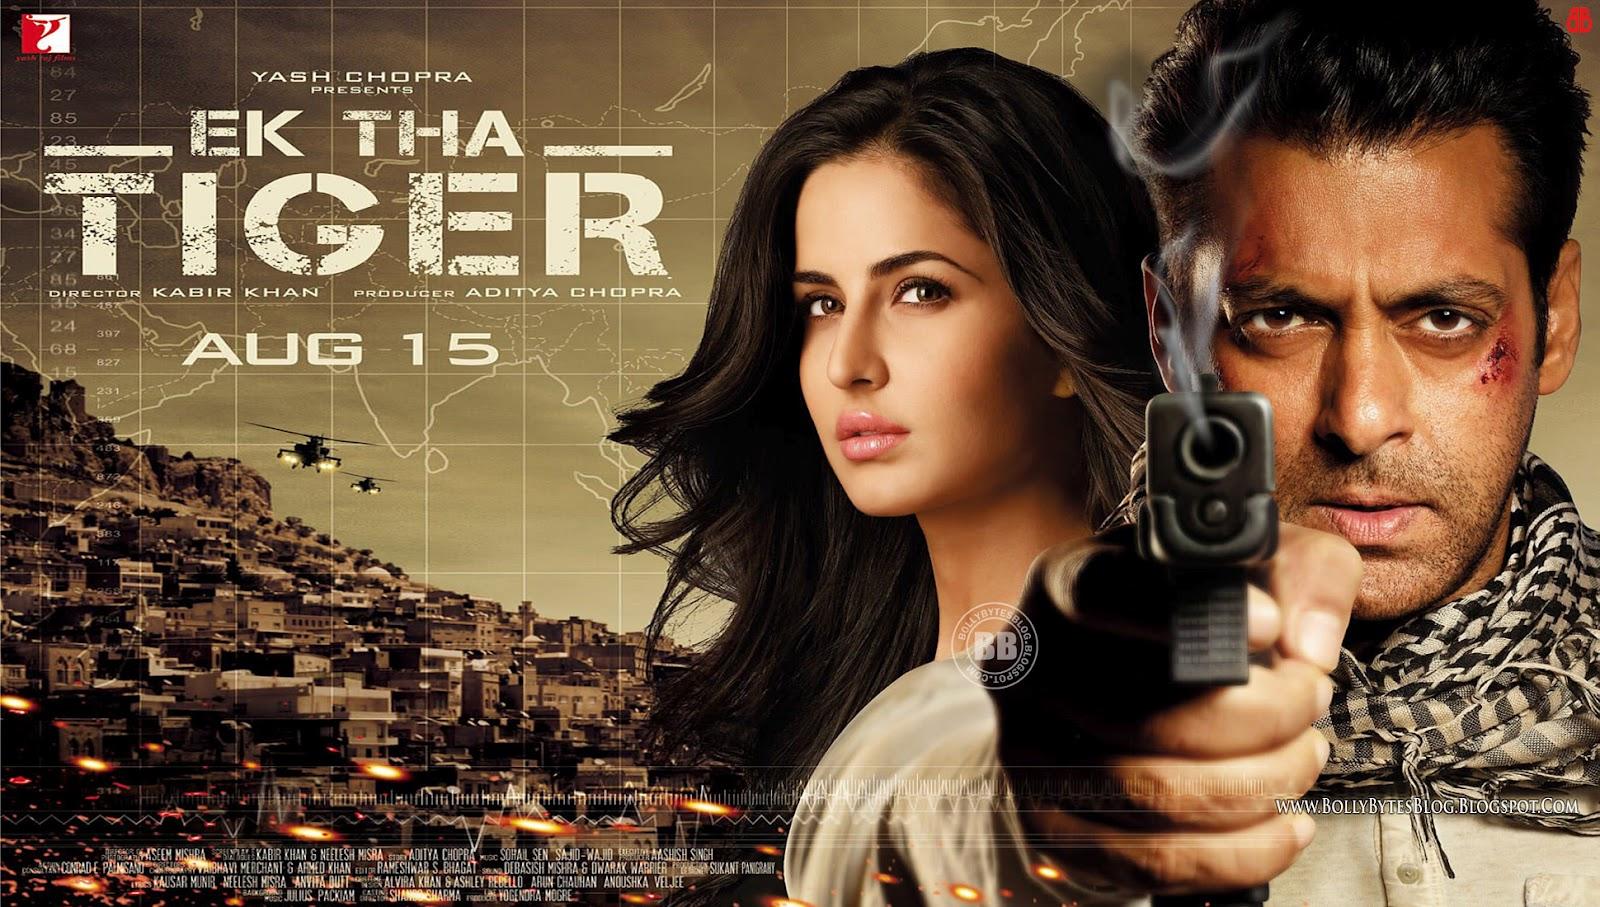 http://3.bp.blogspot.com/-CXg1rB84Emc/UEW5fnrkvwI/AAAAAAAADMg/X4Jo0kBYYPE/s1600/Ek-Tha-Tiger-super-Katrina-Kaif-Salman-Khan-HD-Wallpaper-07.jpg